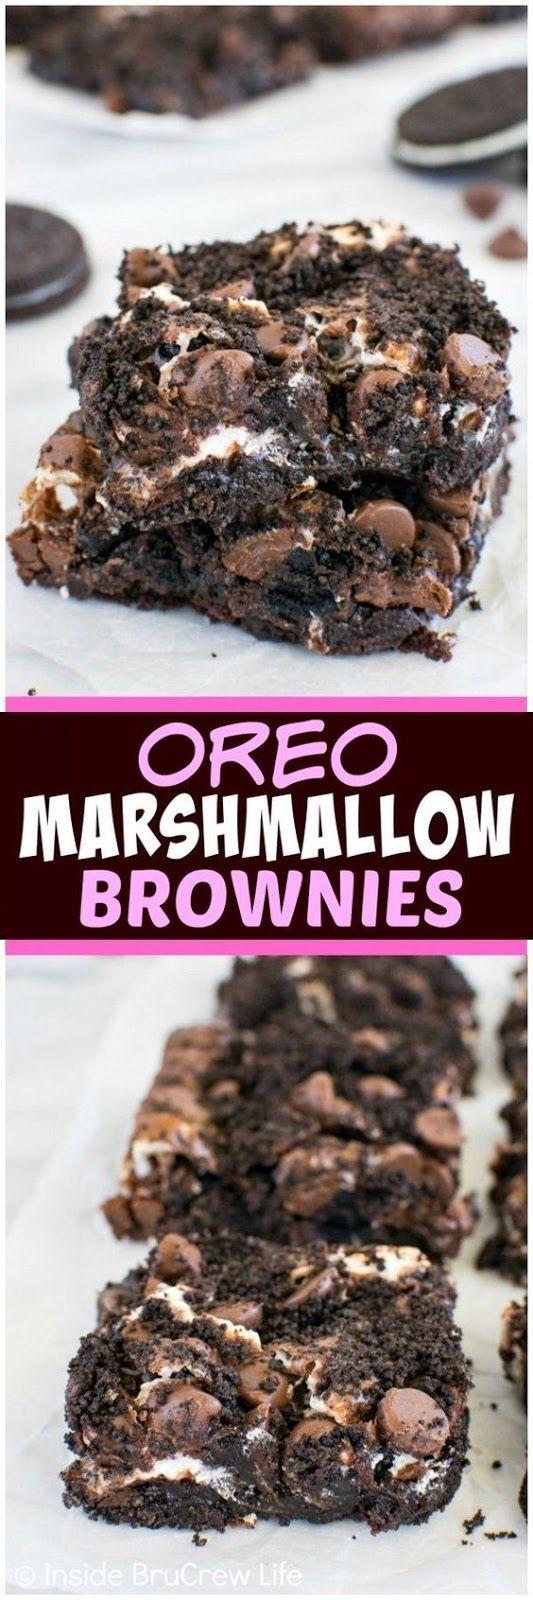 Oreo Marshmallow Brownies